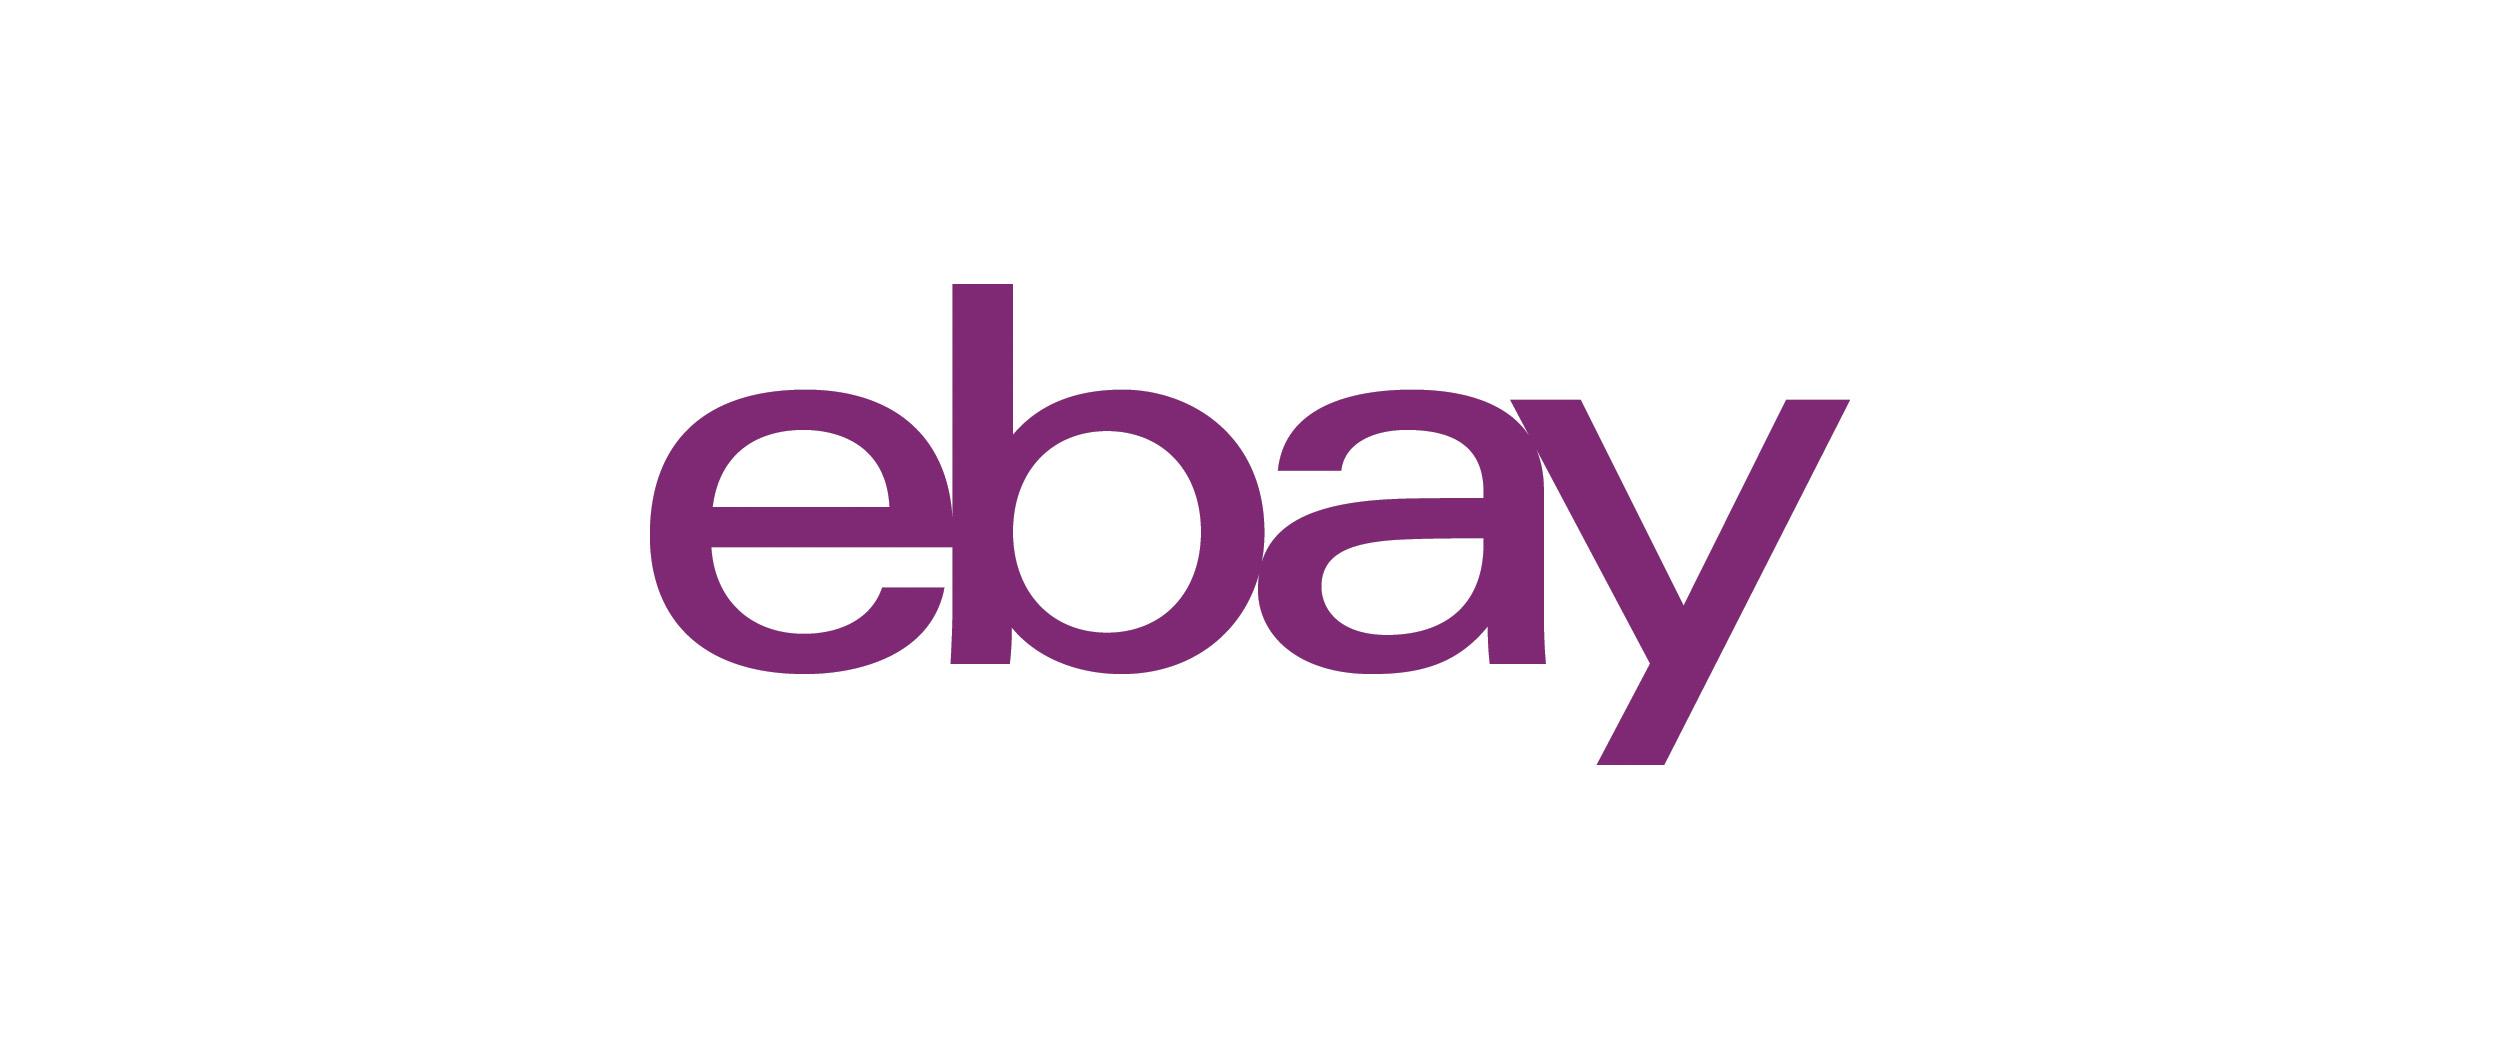 ebay logo copy copy.jpg